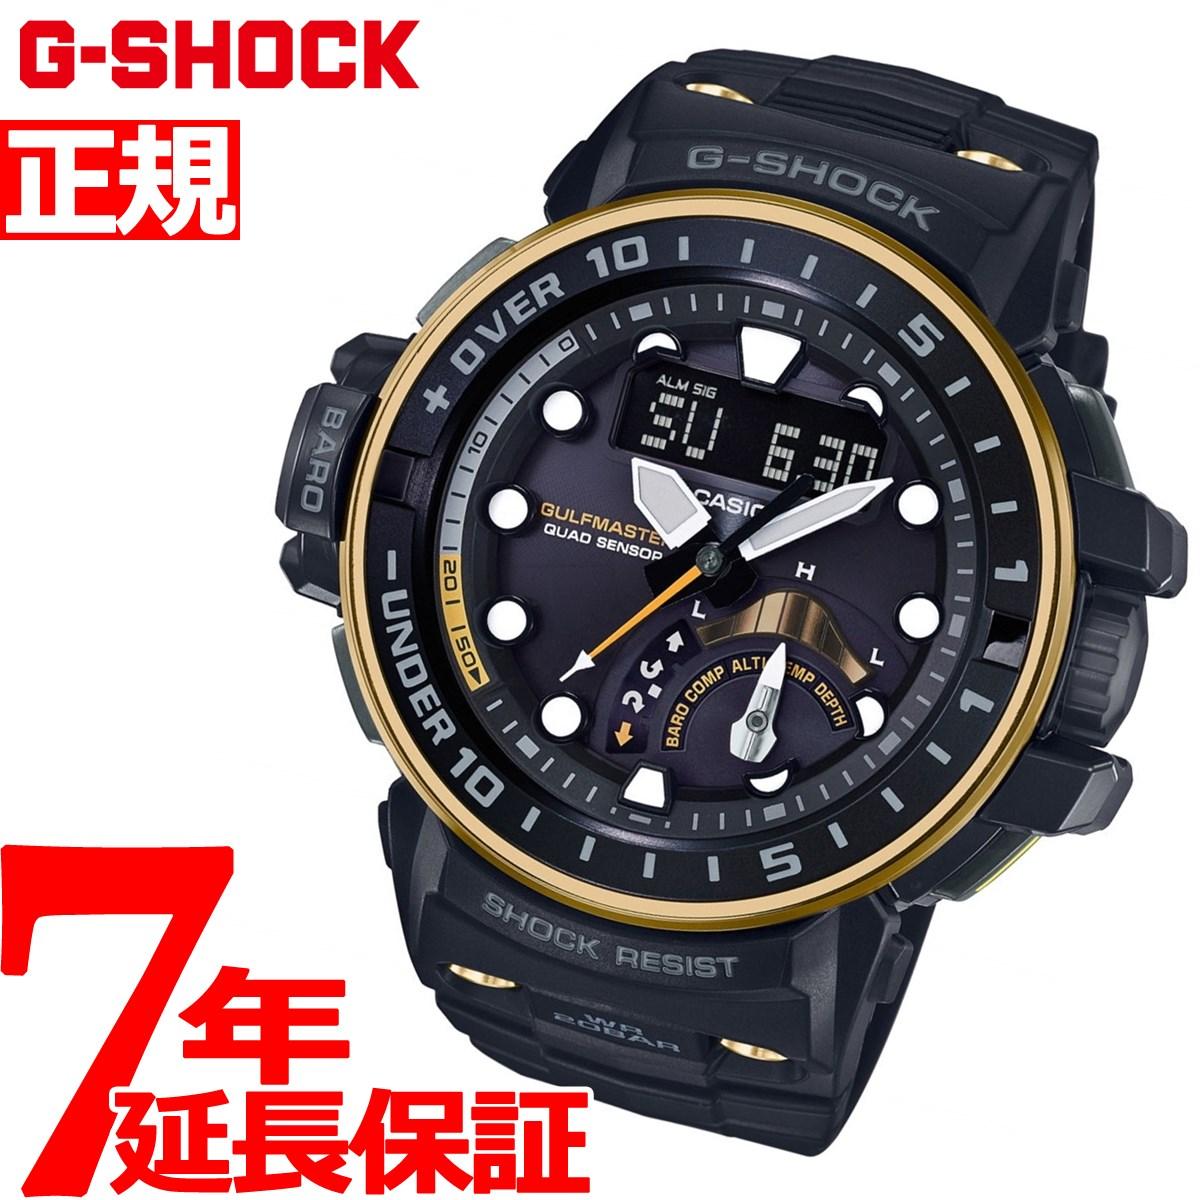 G-SHOCK 電波 ソーラー 電波時計 カシオ Gショック ガルフマスター CASIO GULFMASTER 腕時計 メンズ アナデジ GWN-Q1000GB-1AJF【2018 新作】